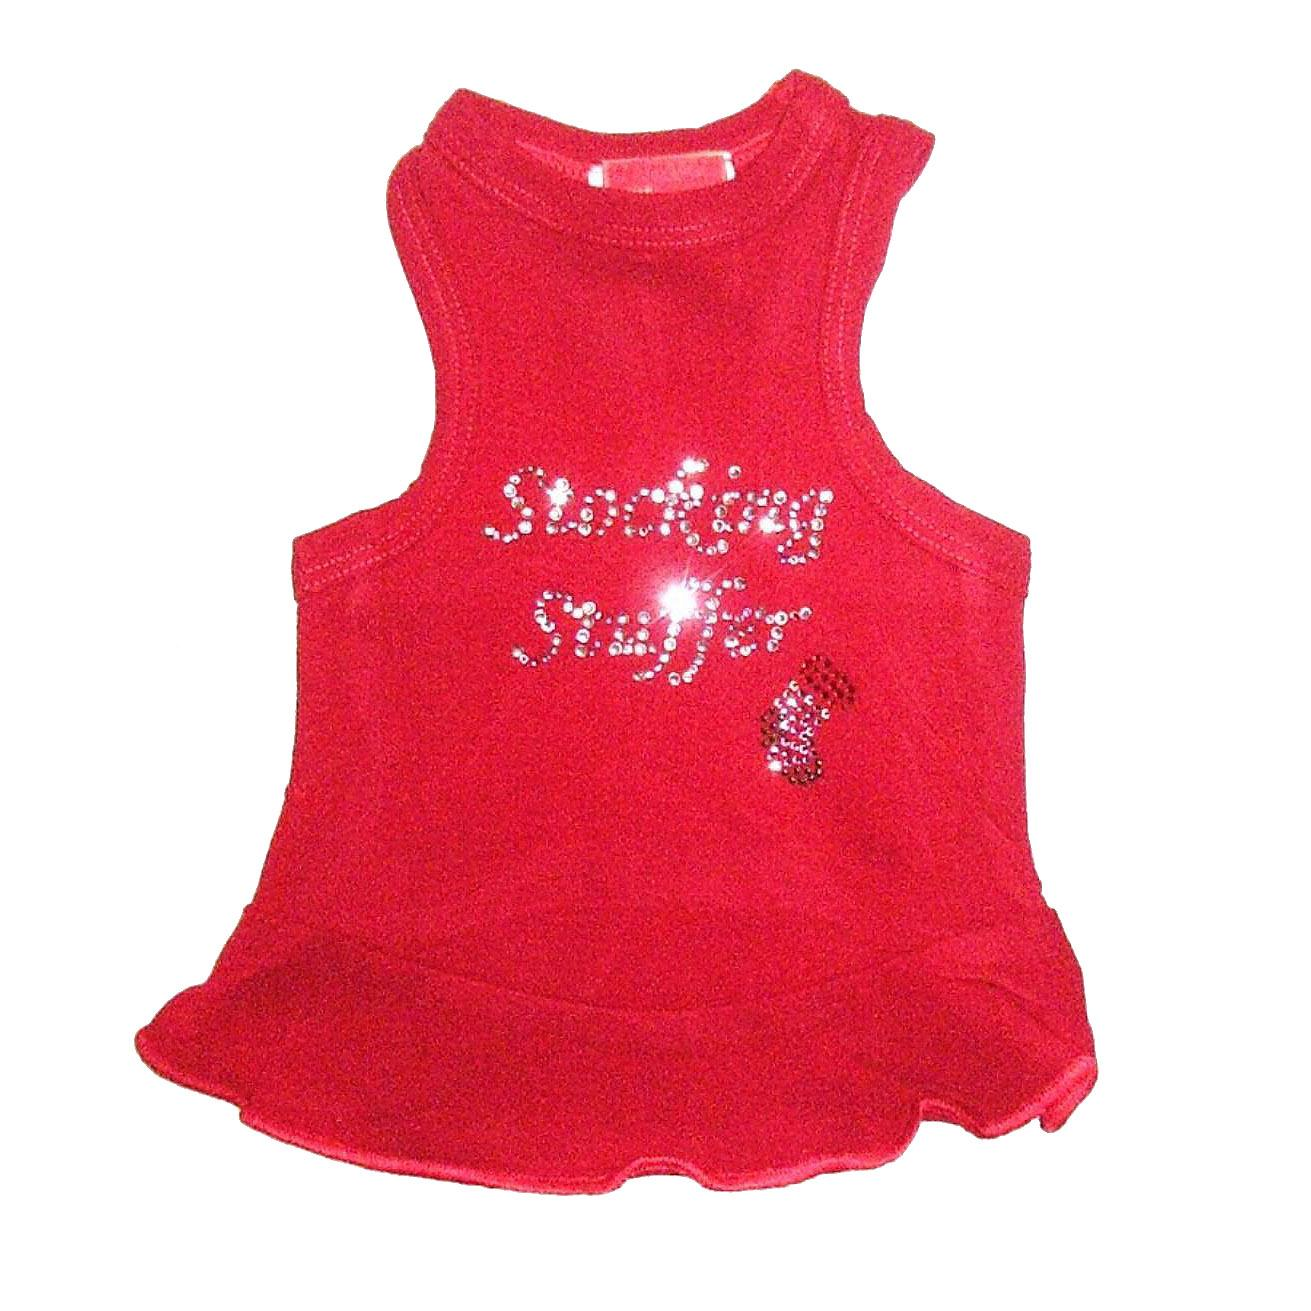 Stocking Stuffer Rhinestone Christmas Dog Dress - Red